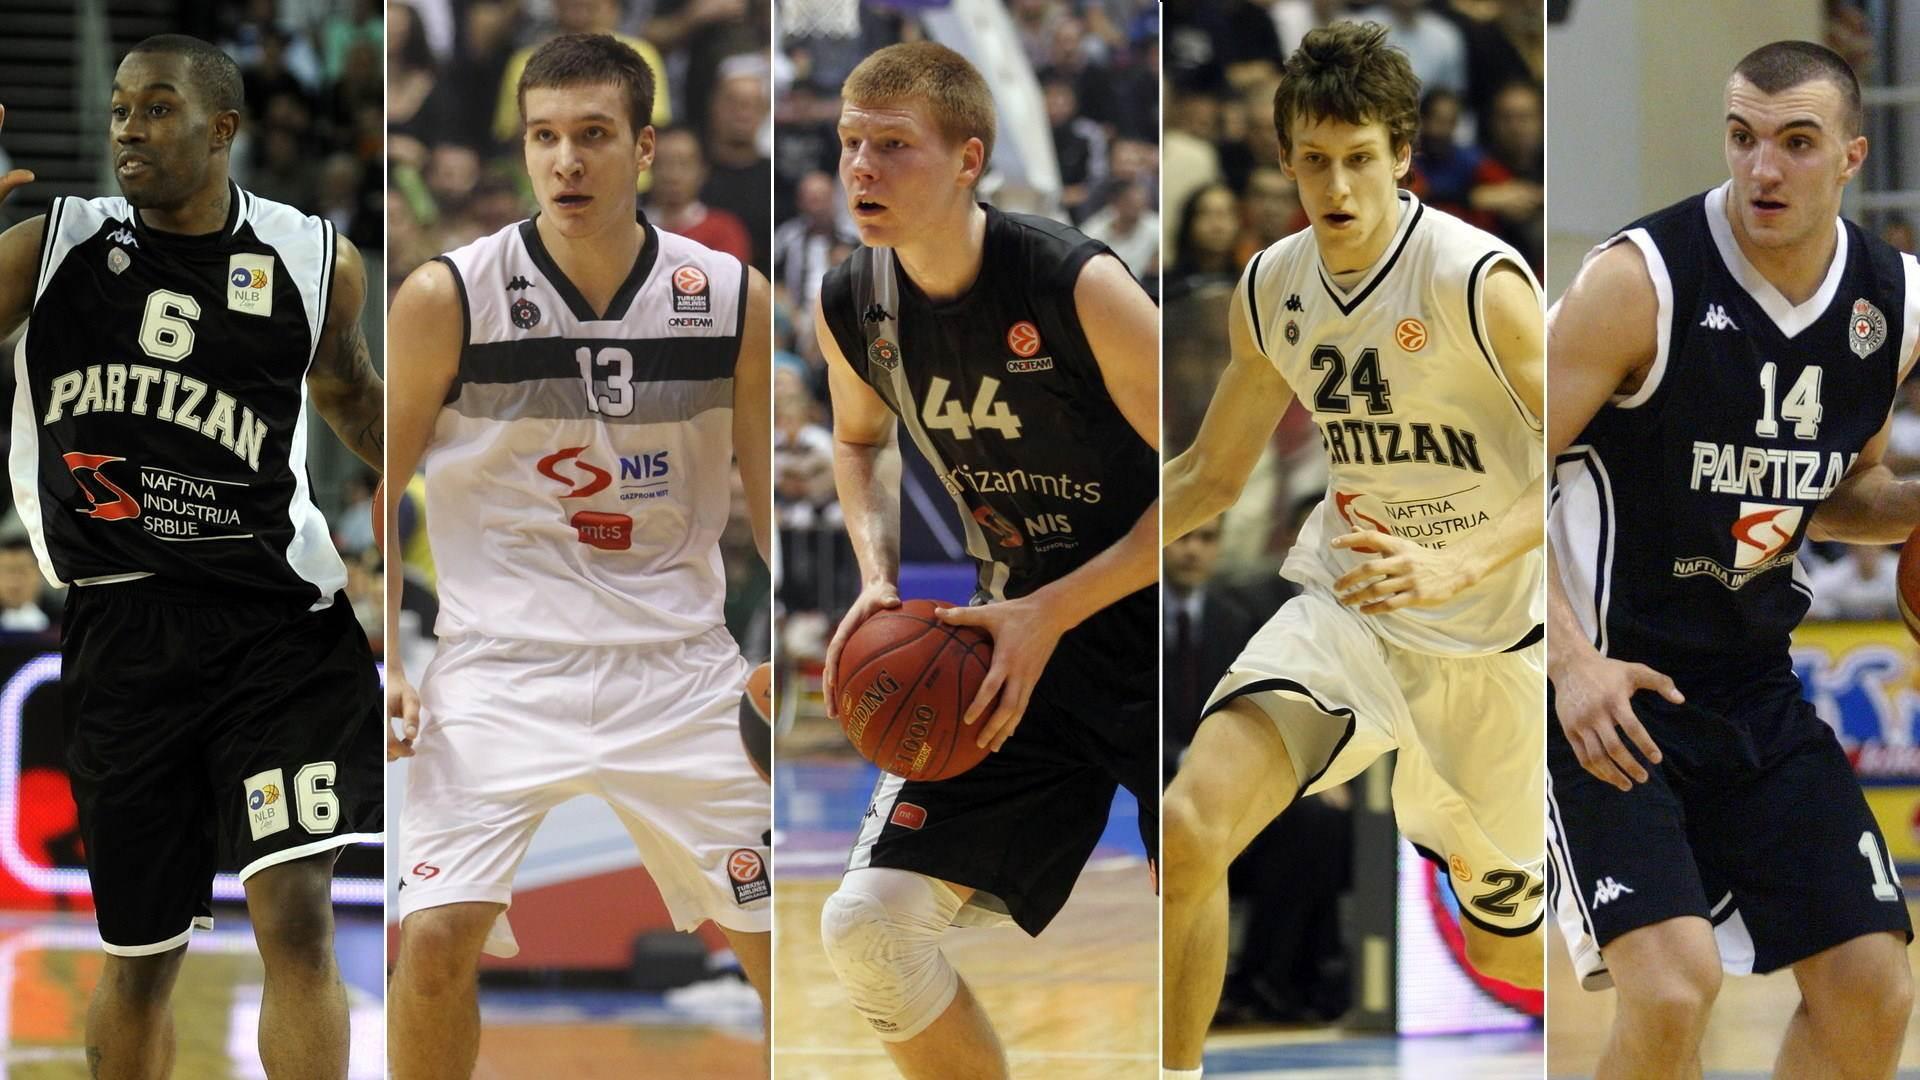 KK Partizan, KKP, Bo Mekejleb, Bogdan Bogdanović, Davis Bertans, Jan Veseli, Nikola Peković